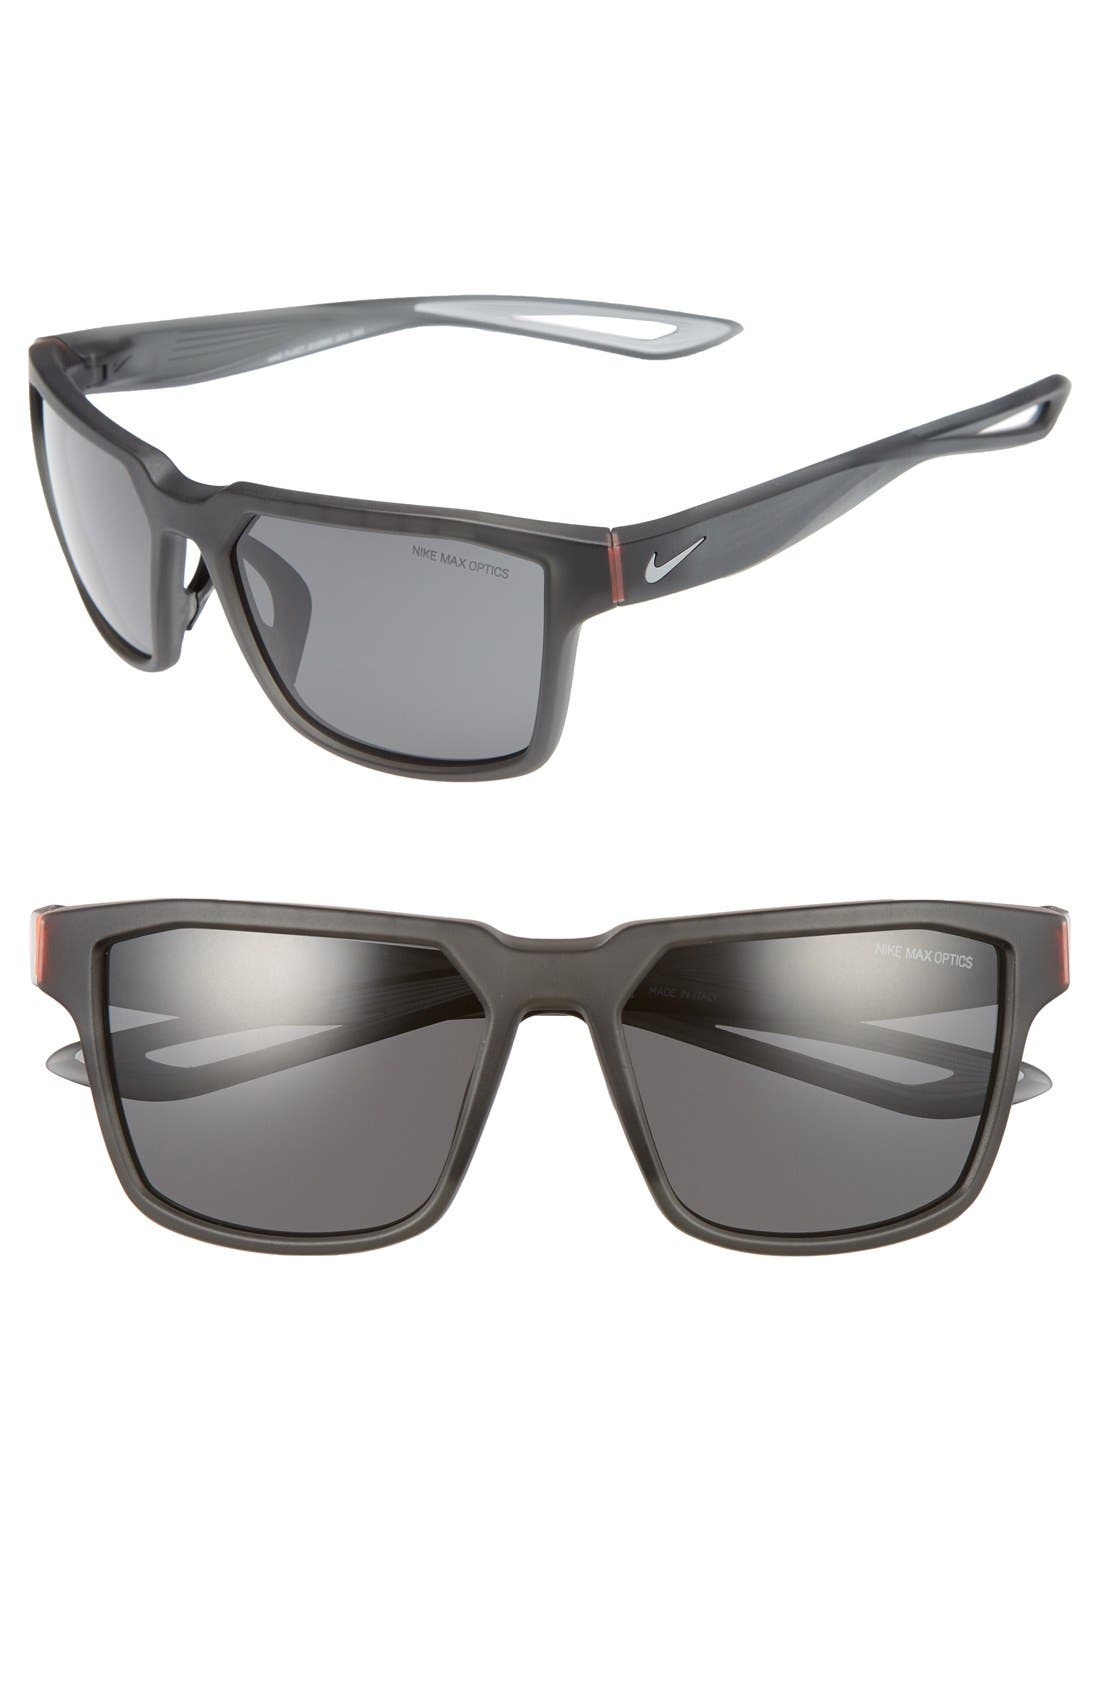 NIKE, Fleet 55mm Sport Sunglasses, Main thumbnail 1, color, MATTE ANTHRACITE